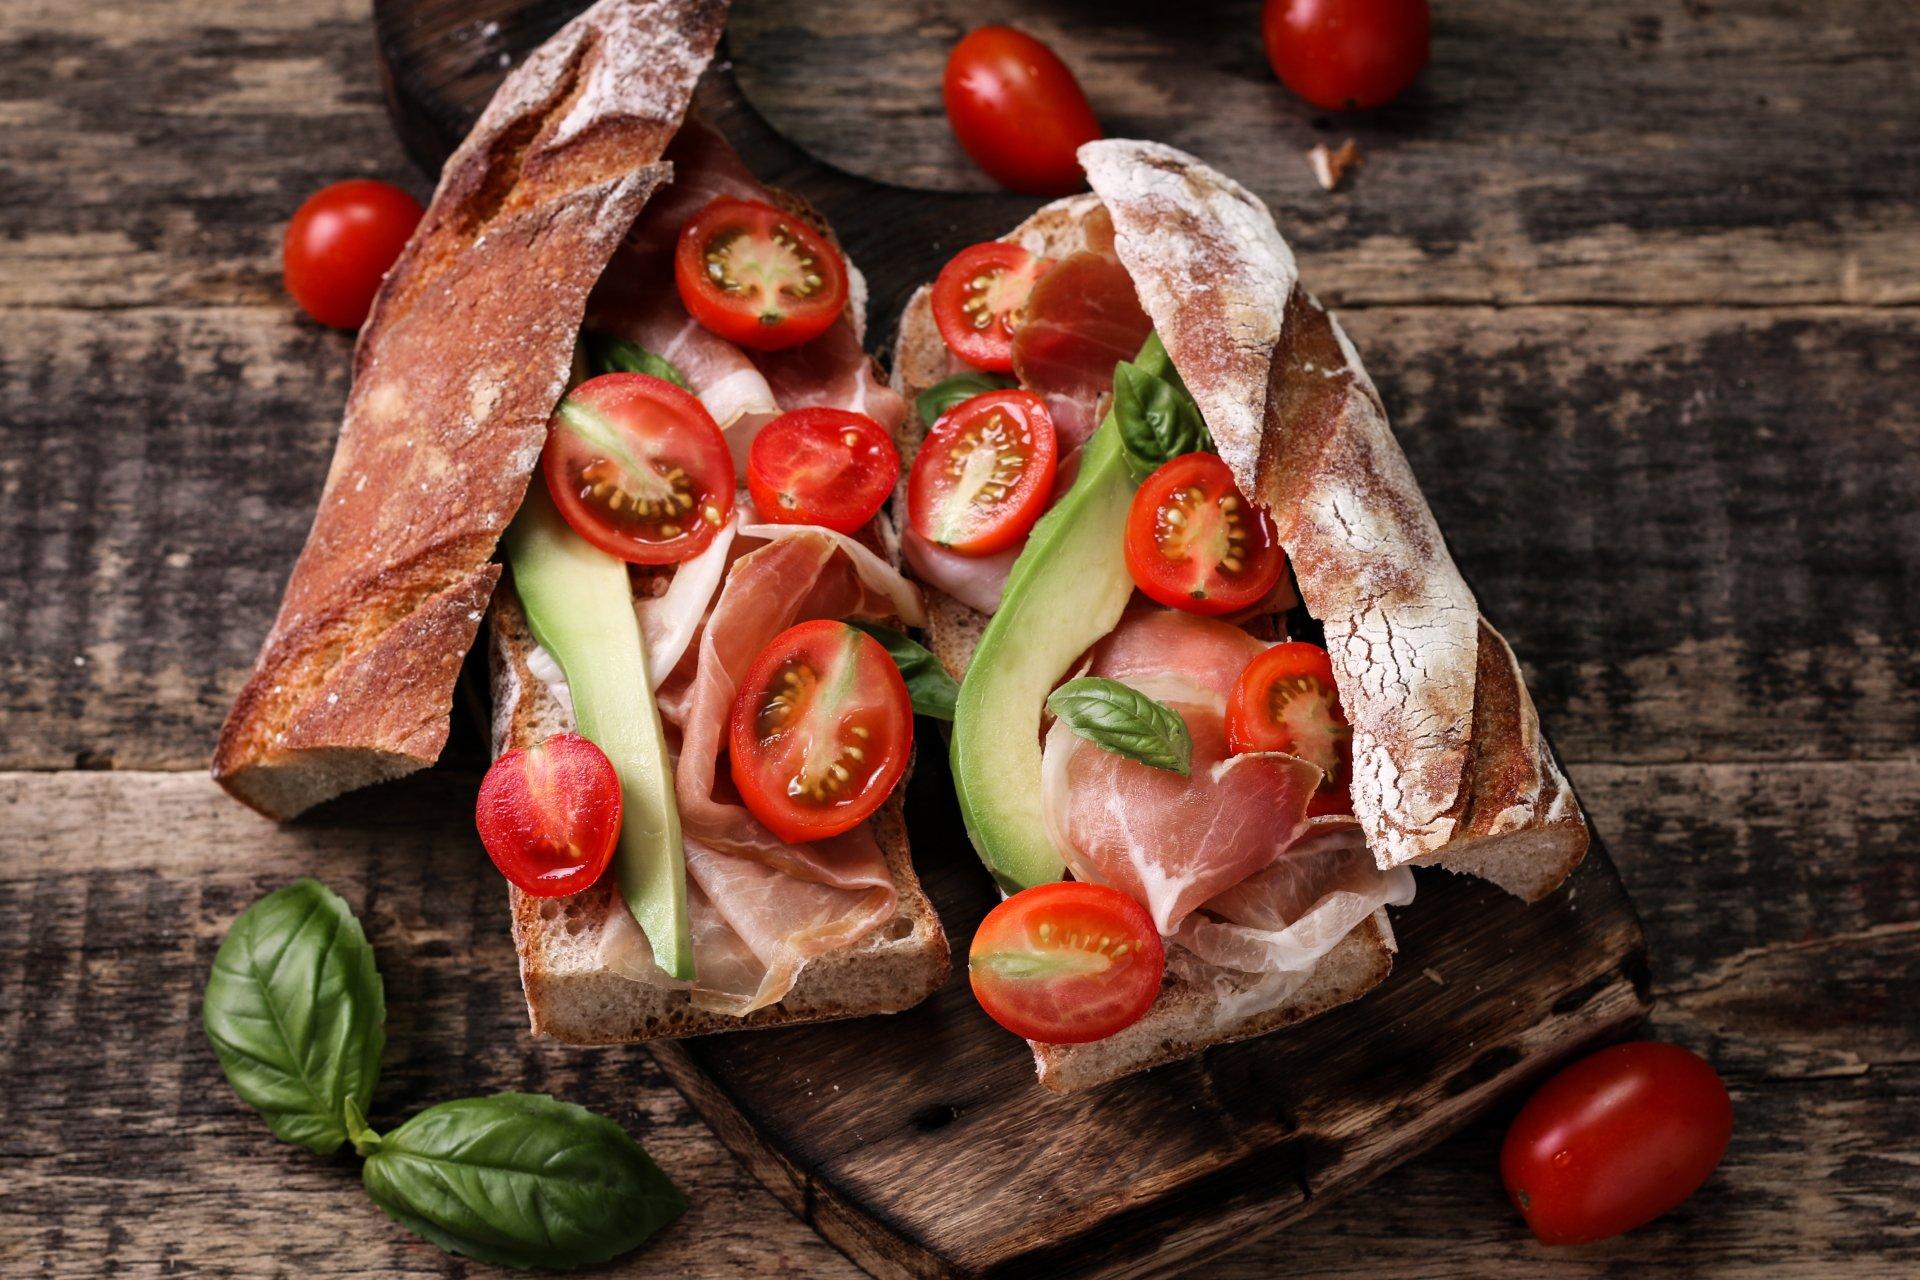 Food - Sandwich  Still Life Tomato Bread Wallpaper